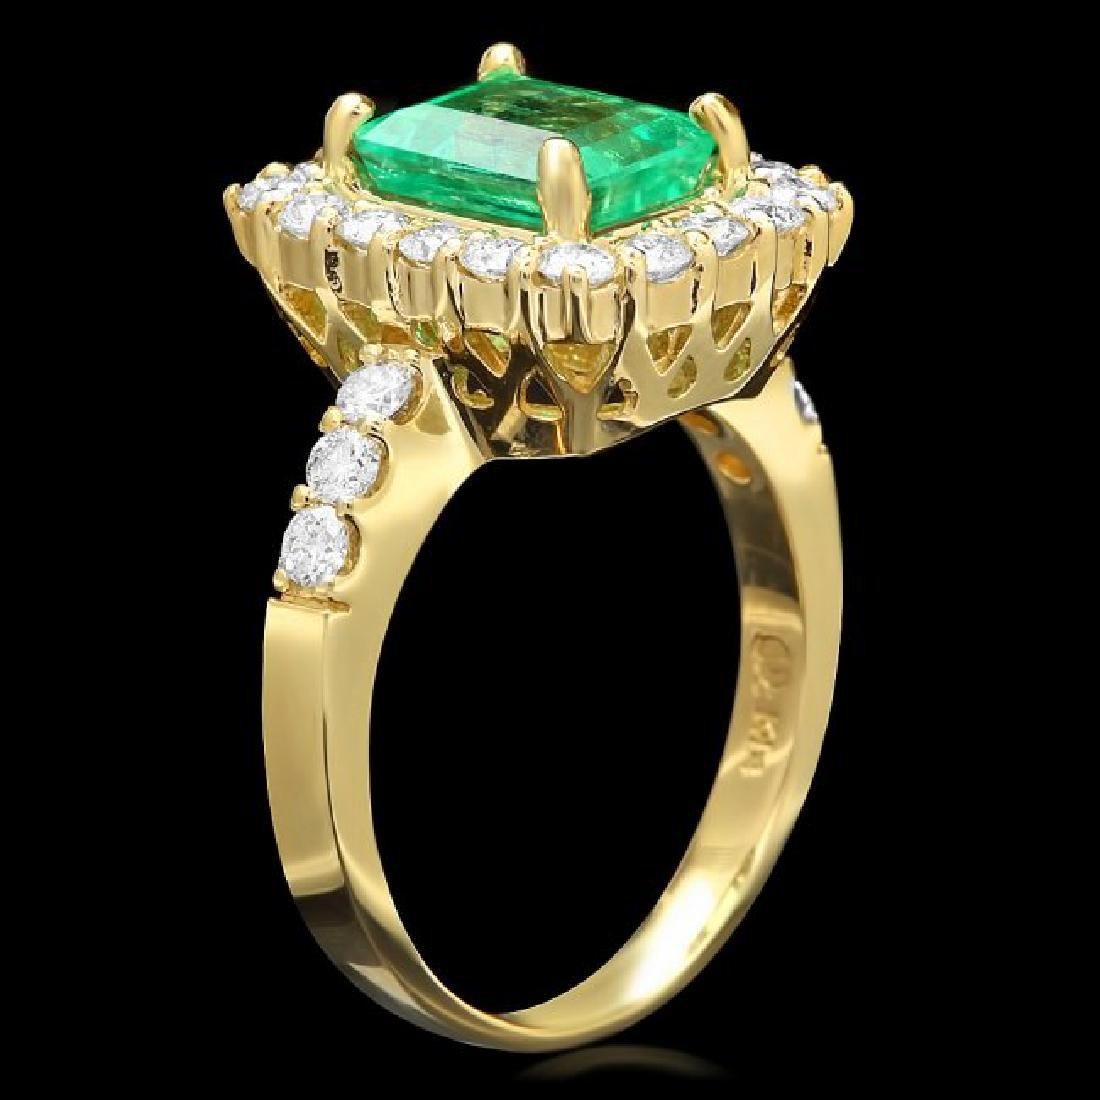 14k Gold 1.80ct Emerald 1.00ct Diamond Ring - 2